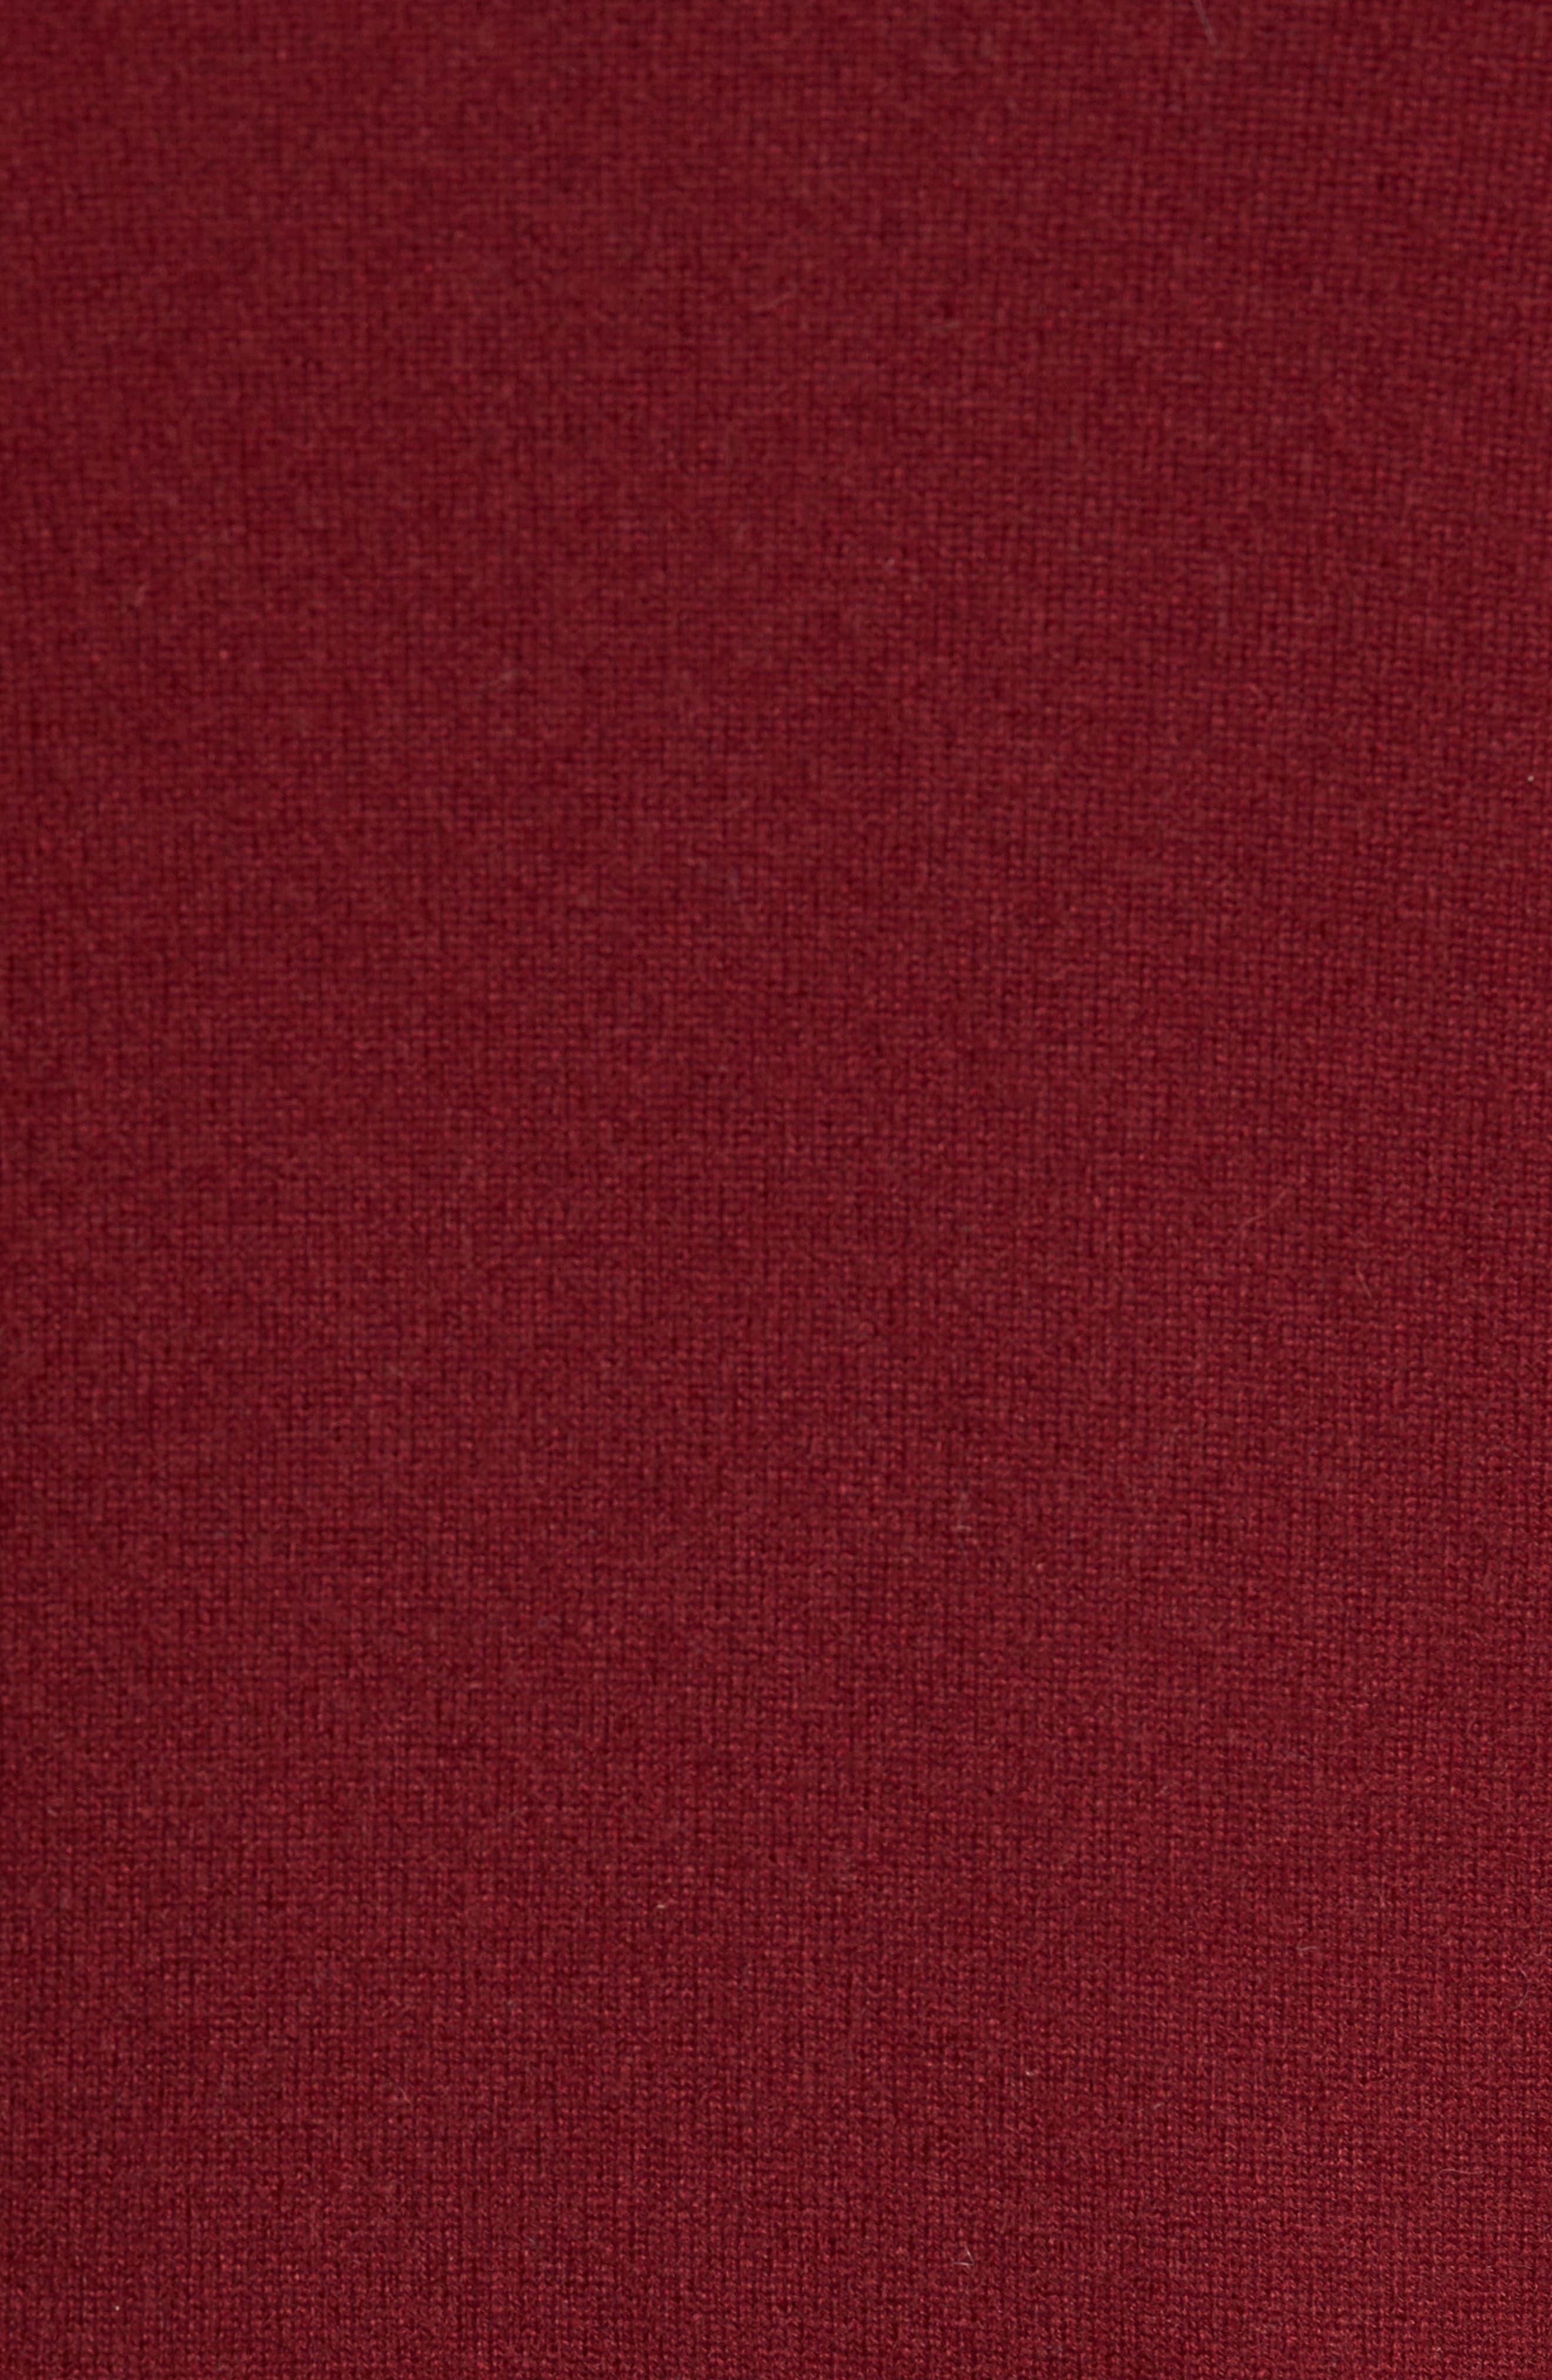 Cashmere V-Neck Sweater,                             Alternate thumbnail 30, color,